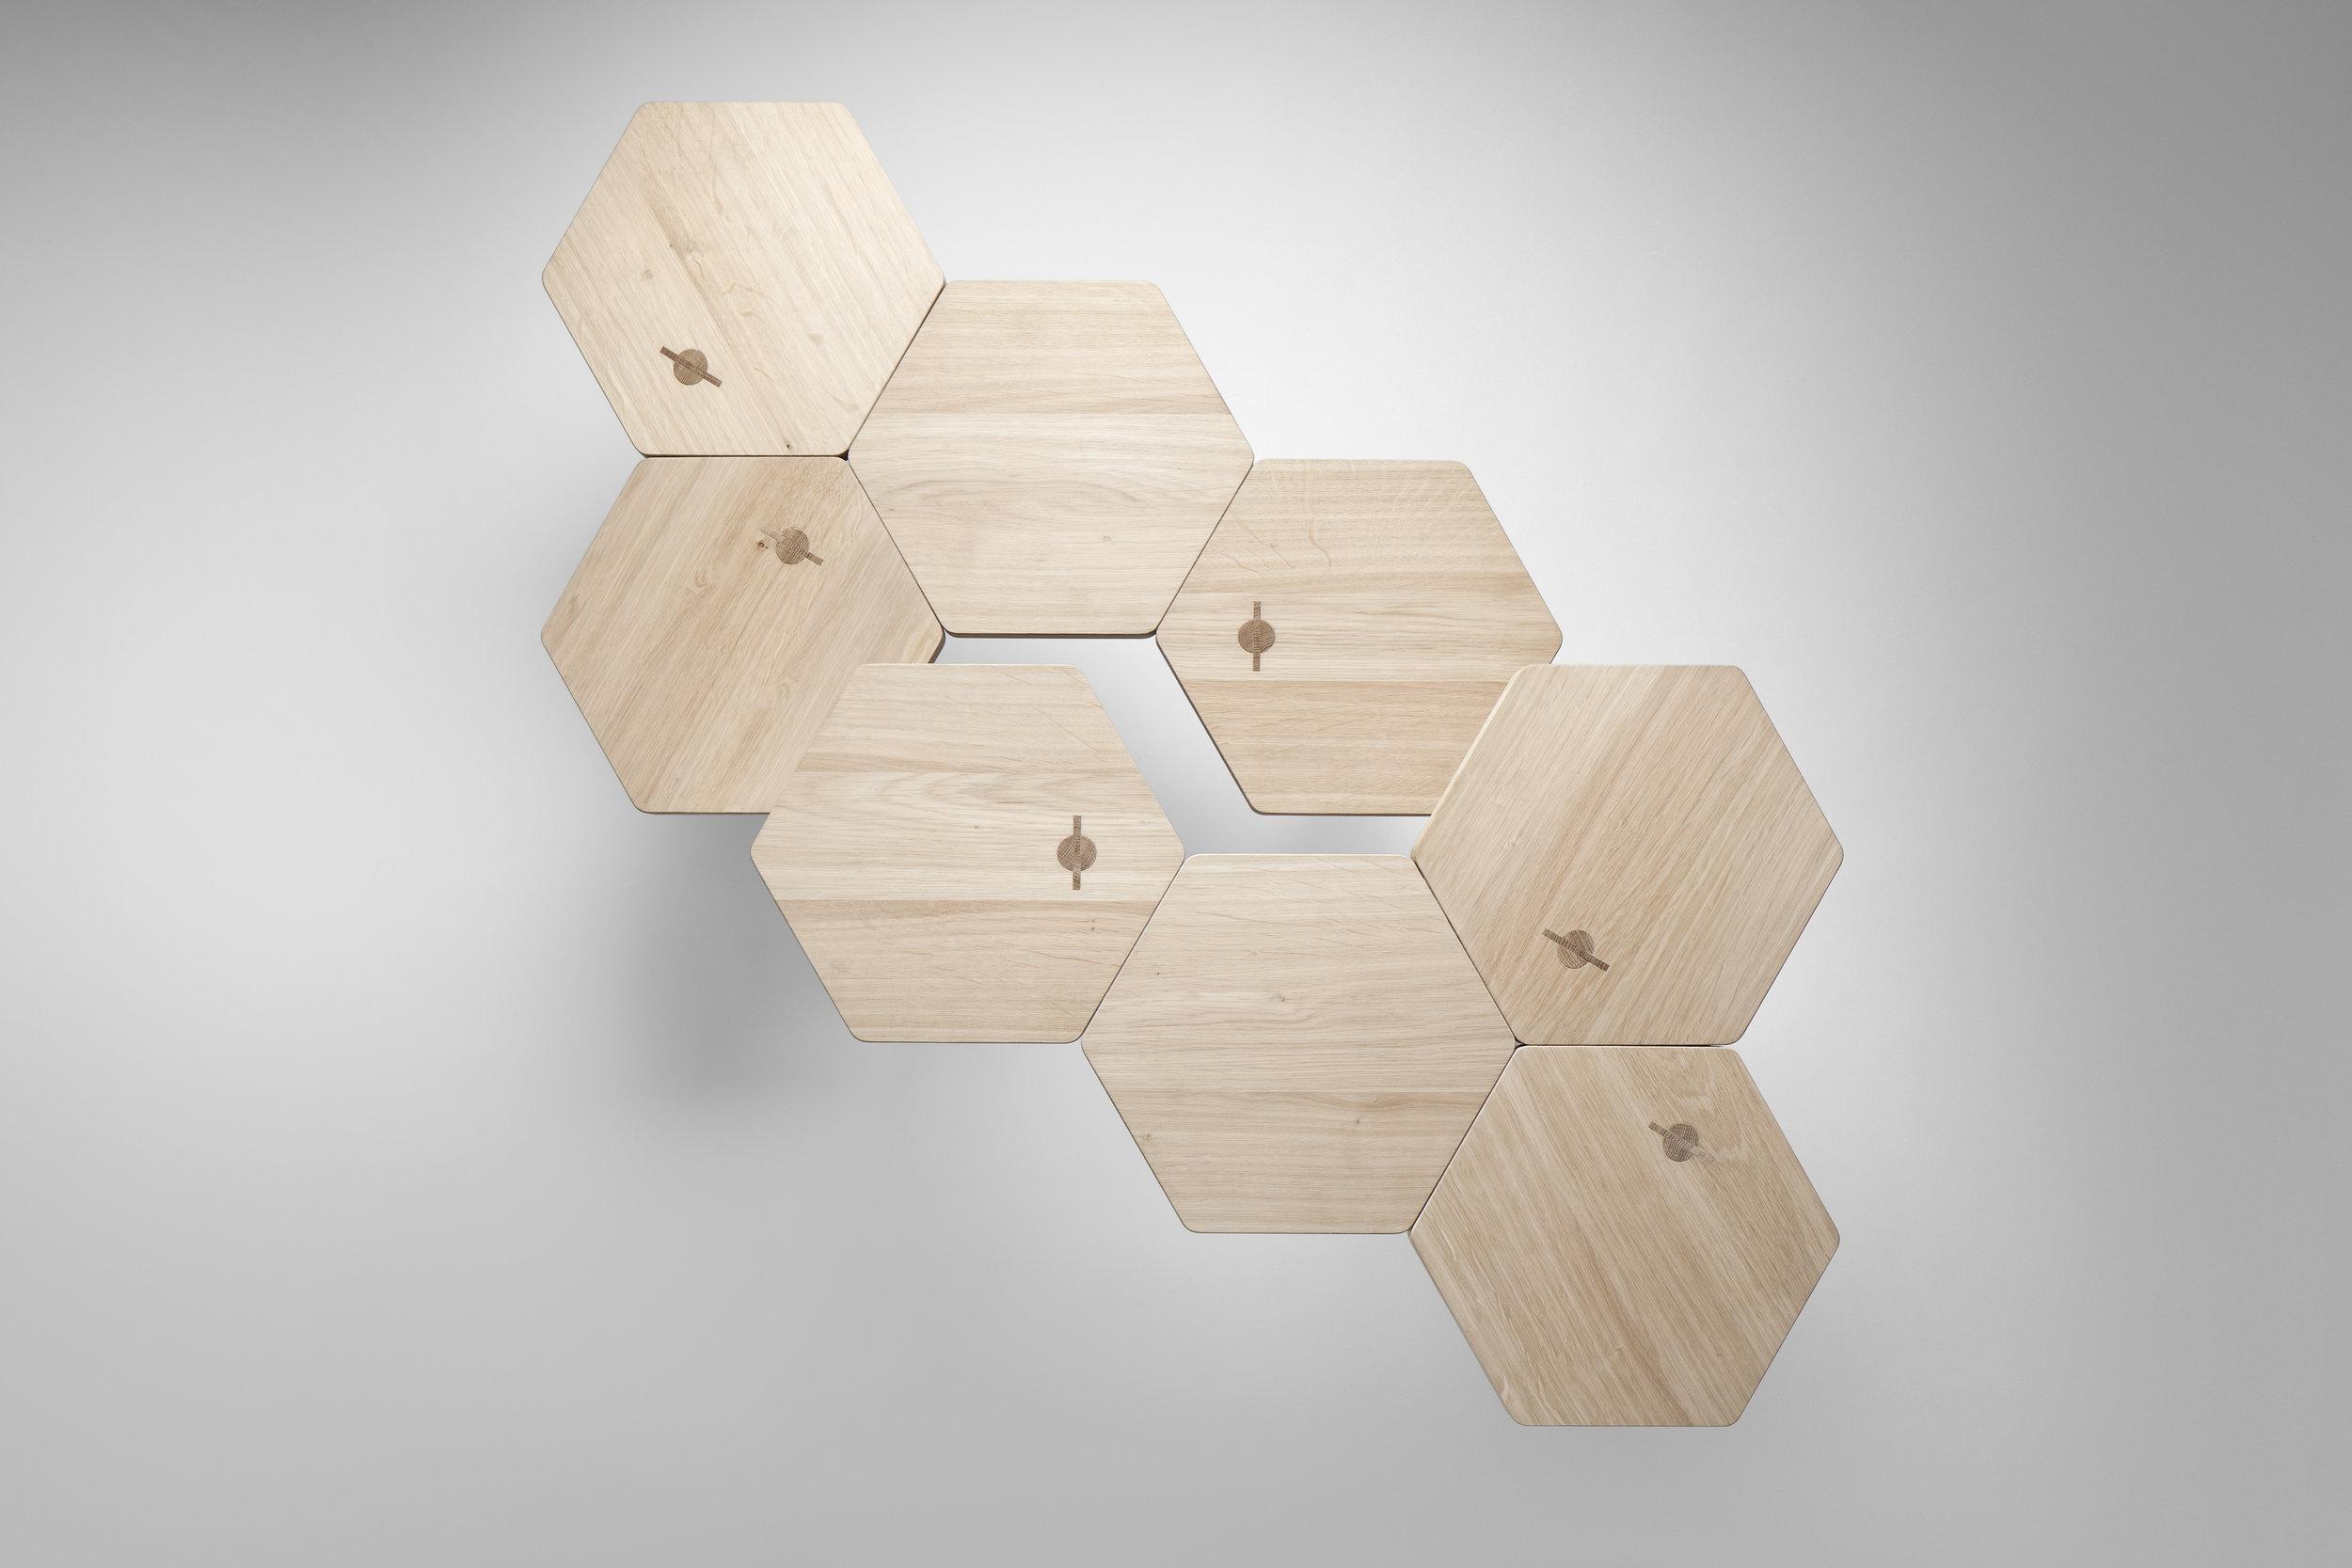 lean-tables_lighting-design_coordination-berlin_02.jpg